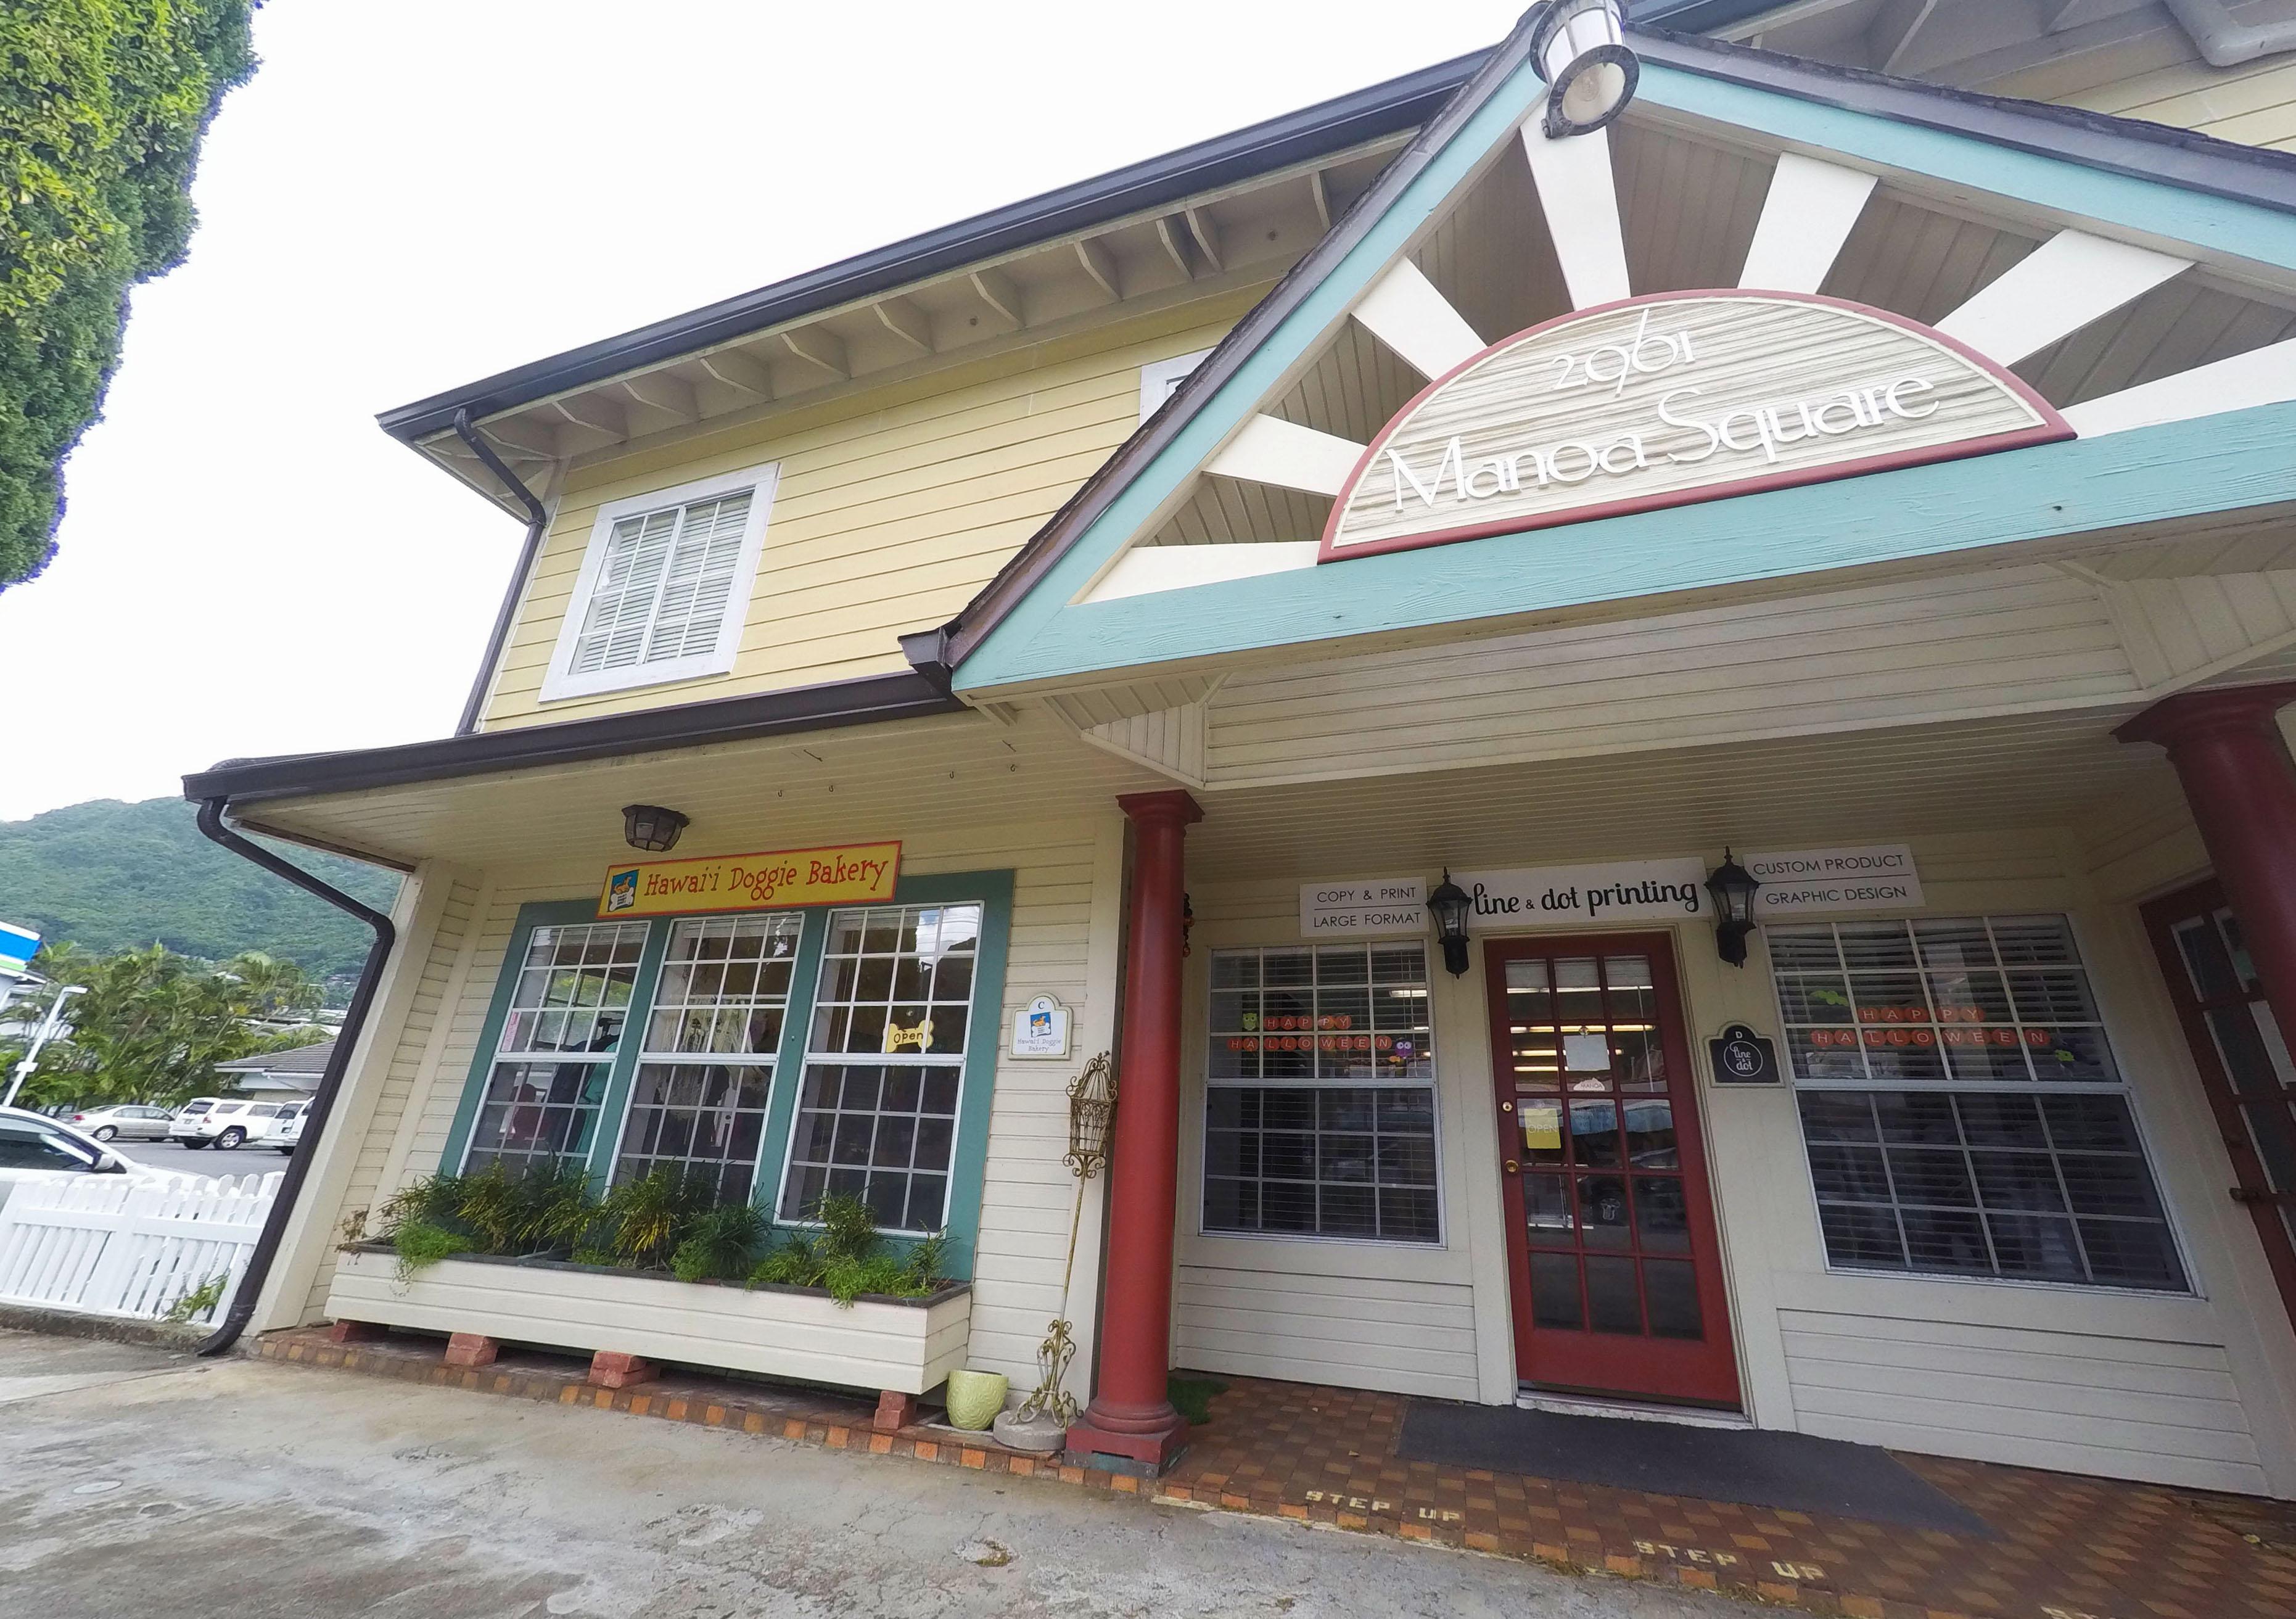 Hawaii Doggie Bakery - Exterior